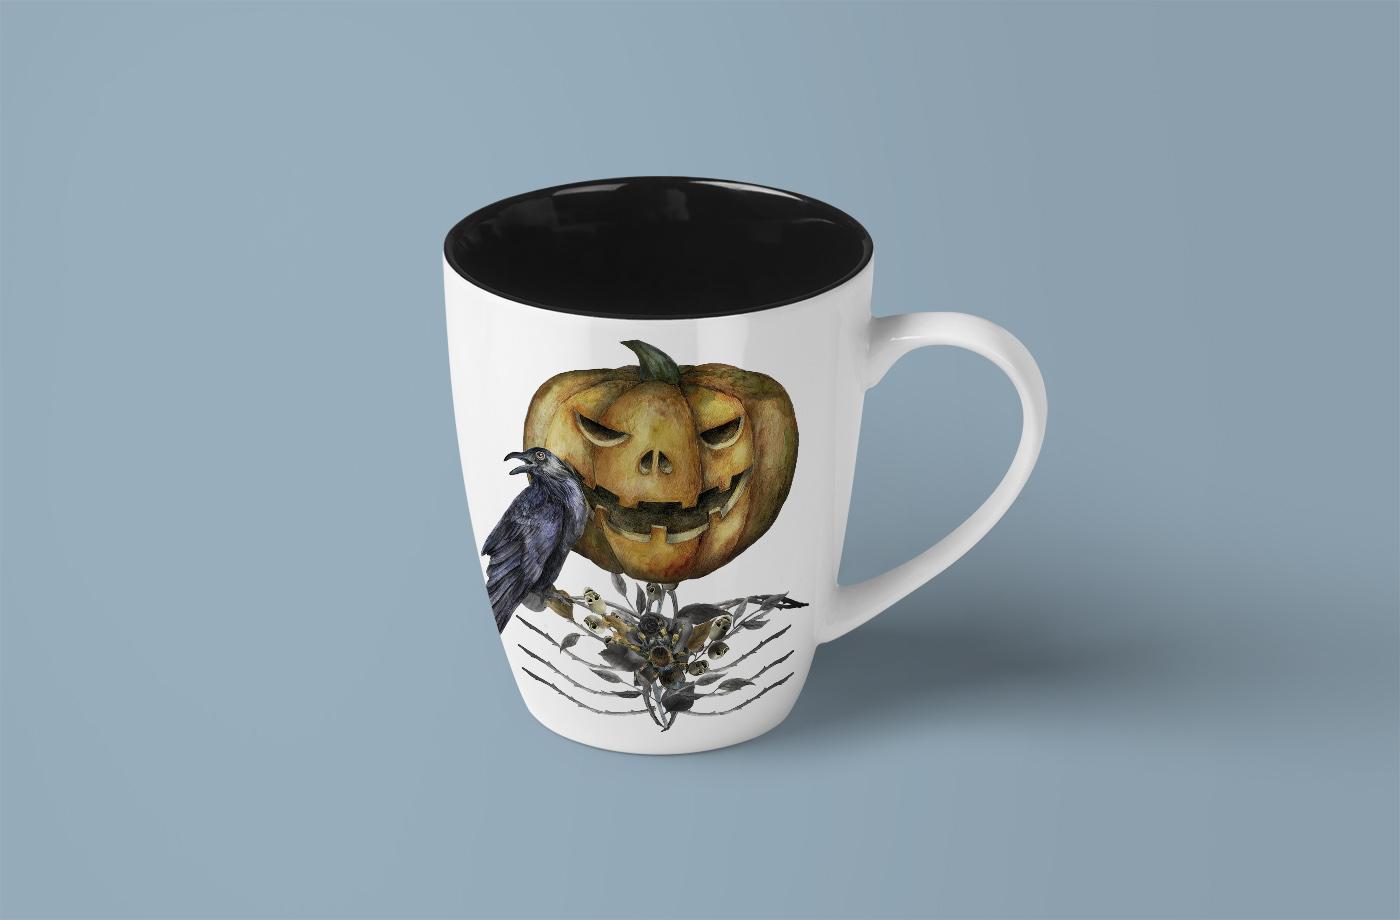 Jack o Lanter Halloween clipart, evil vintage gothic pumpkin example image 8